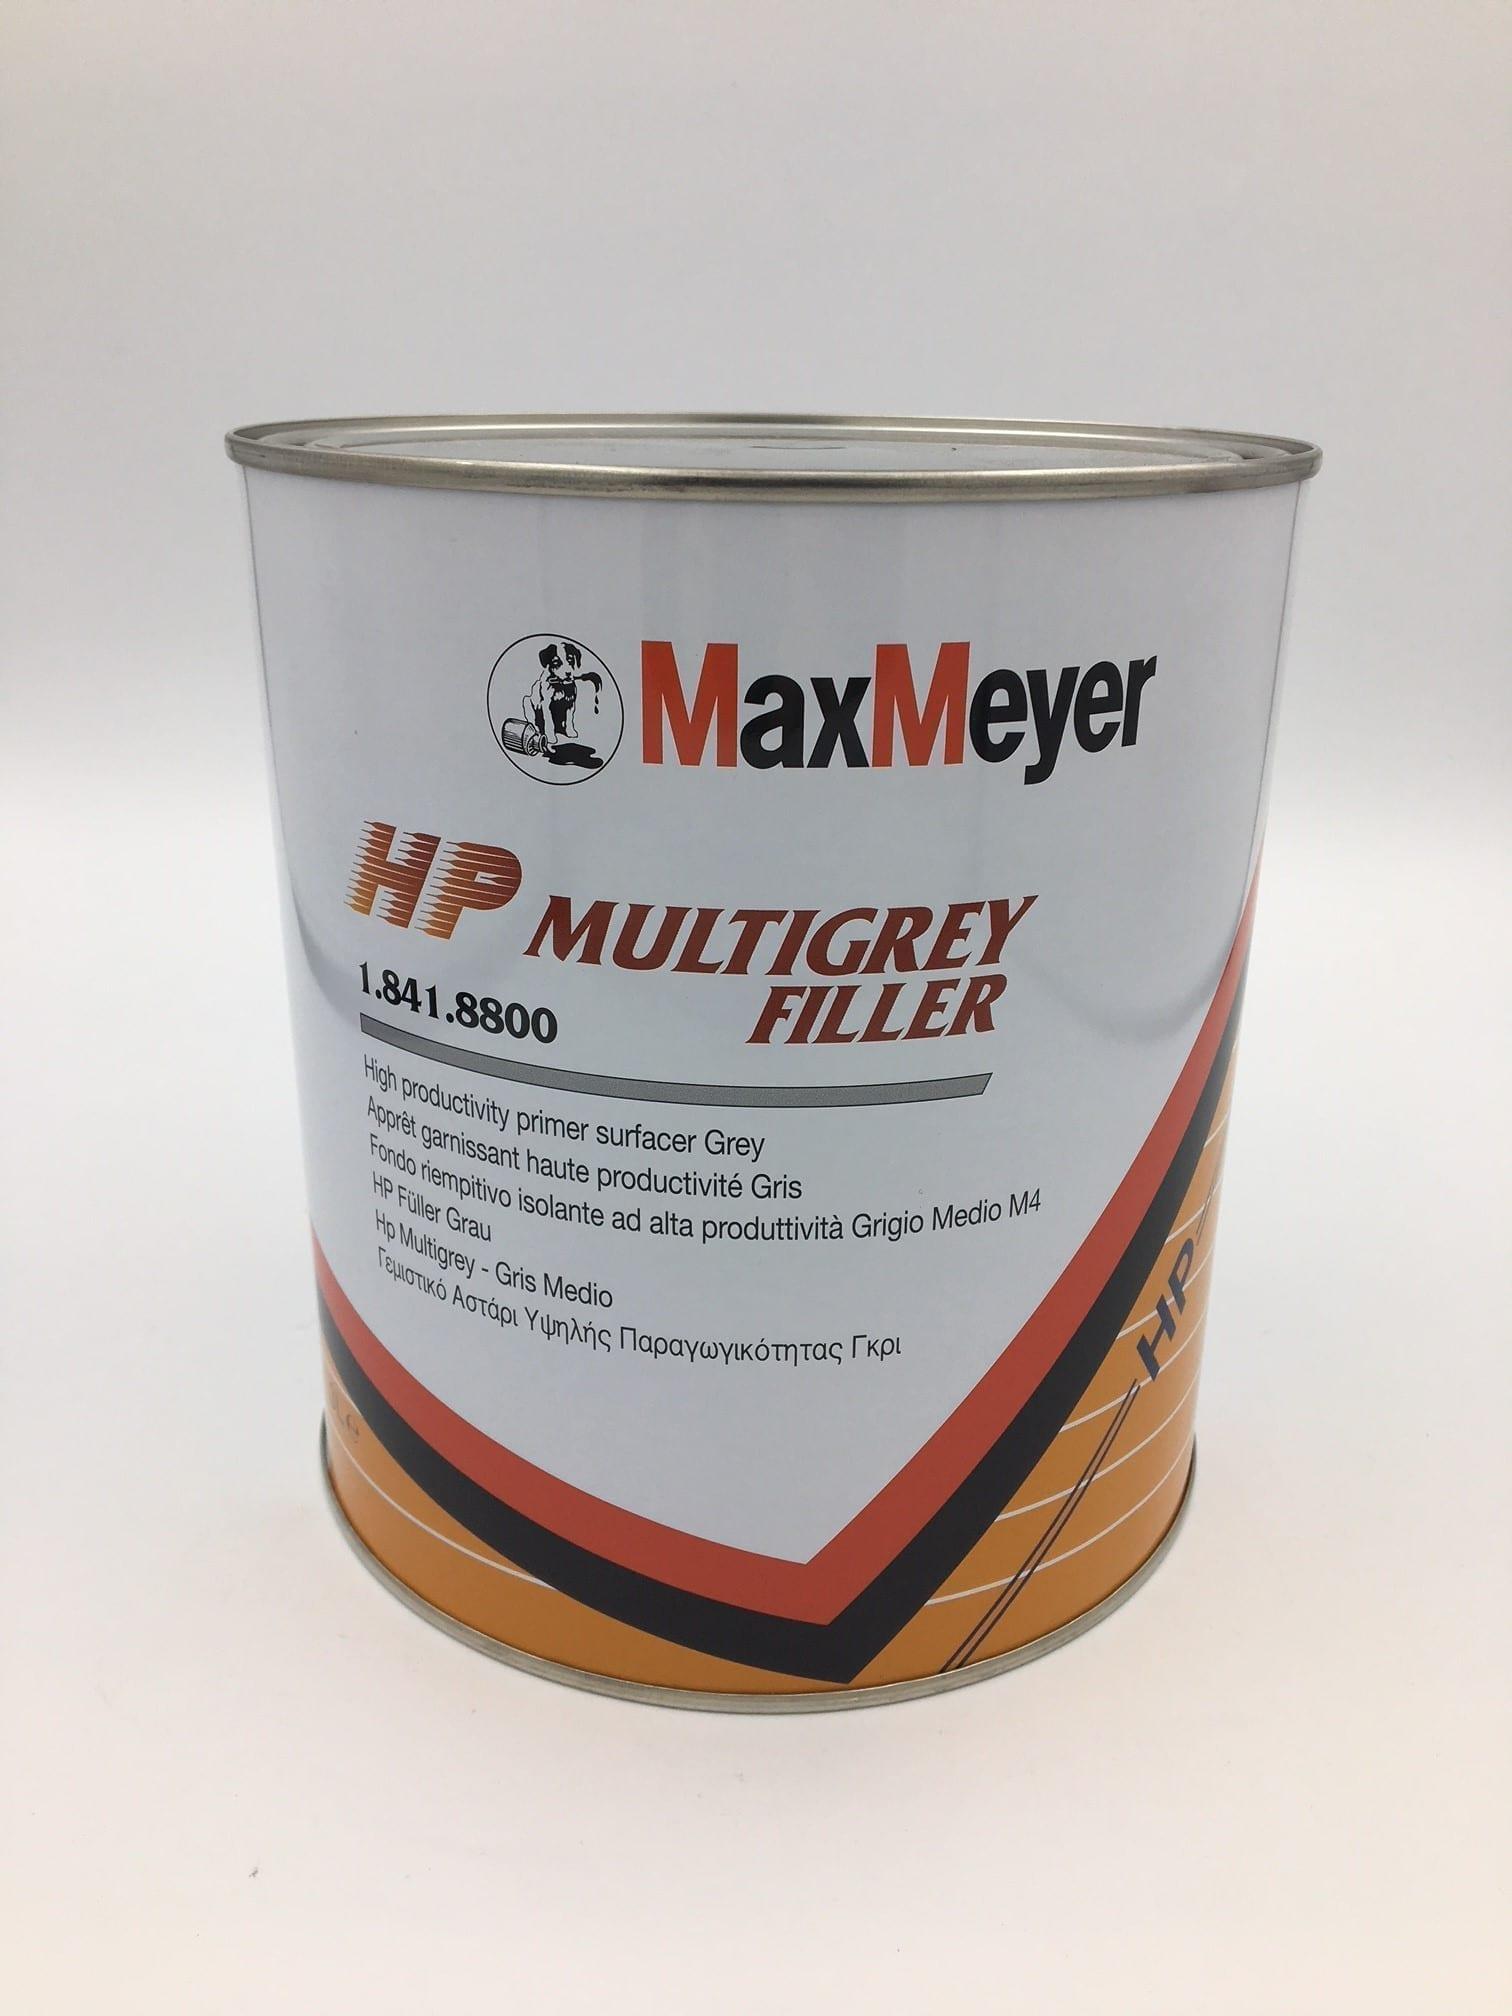 Max Meyer 8900 MultiGrey Filler (Dark Grey) 3L